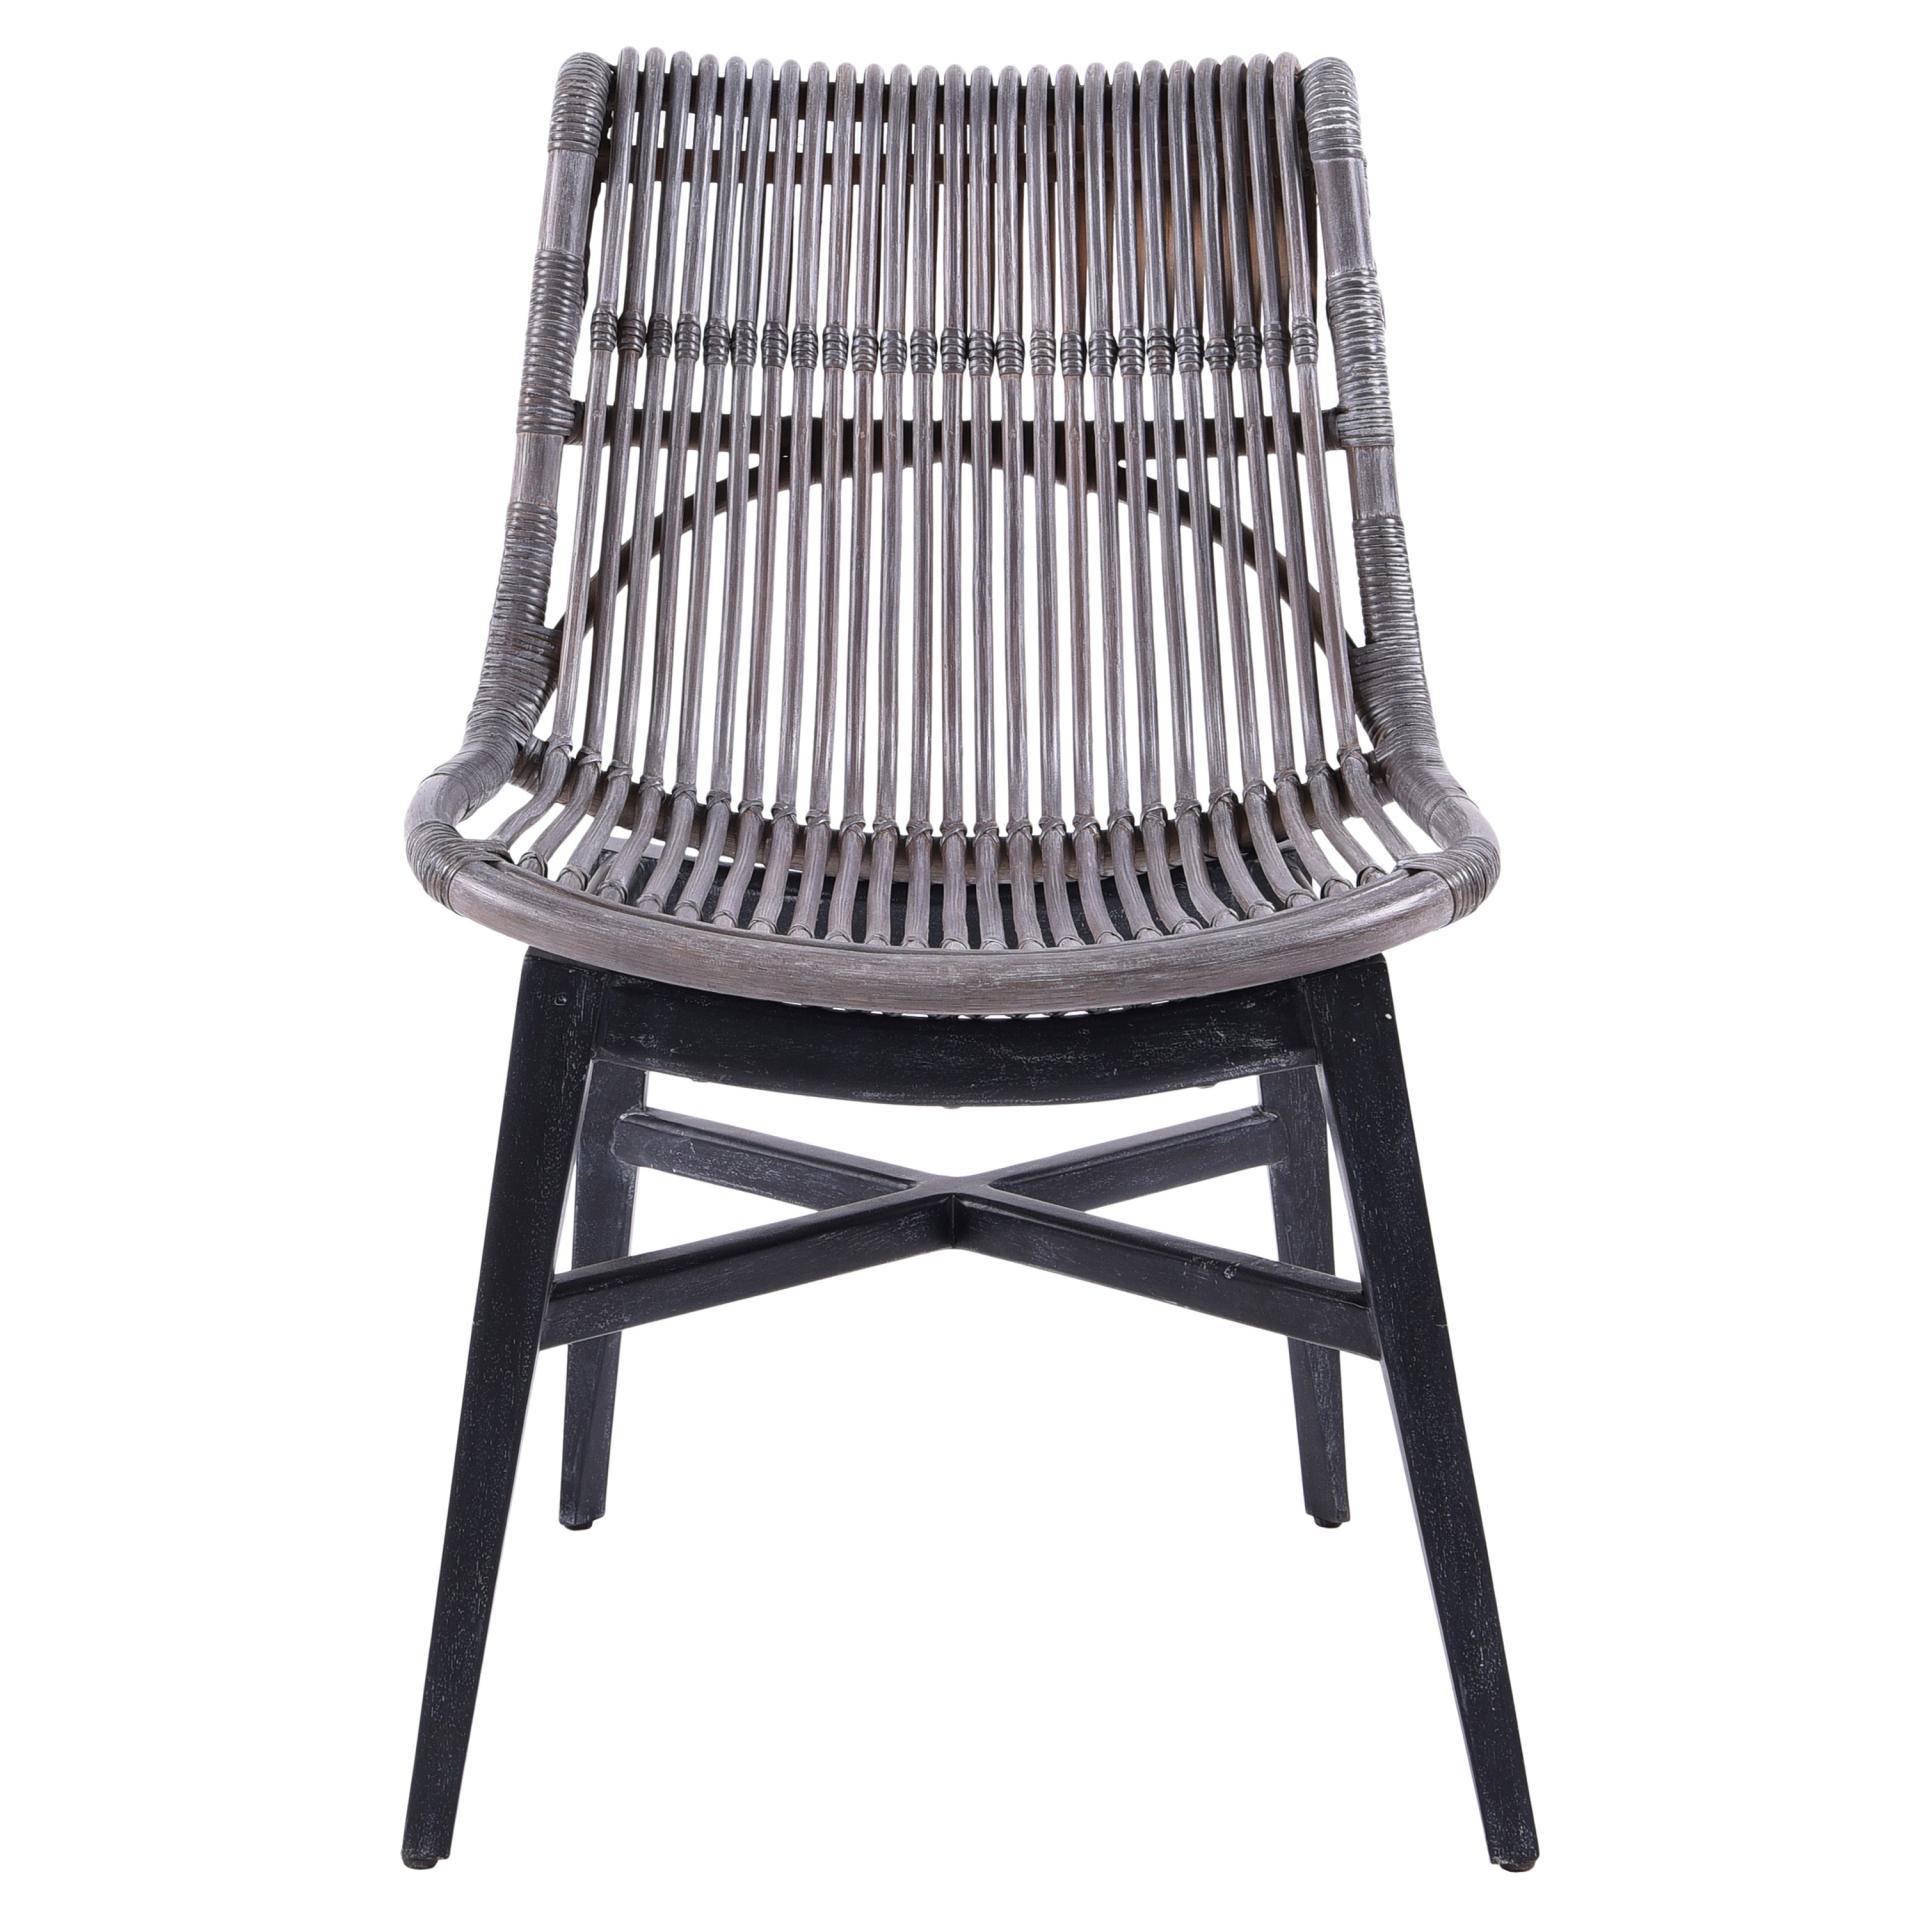 7100002 Npd Home Furniture Wholesale Lifestyle Furnishings